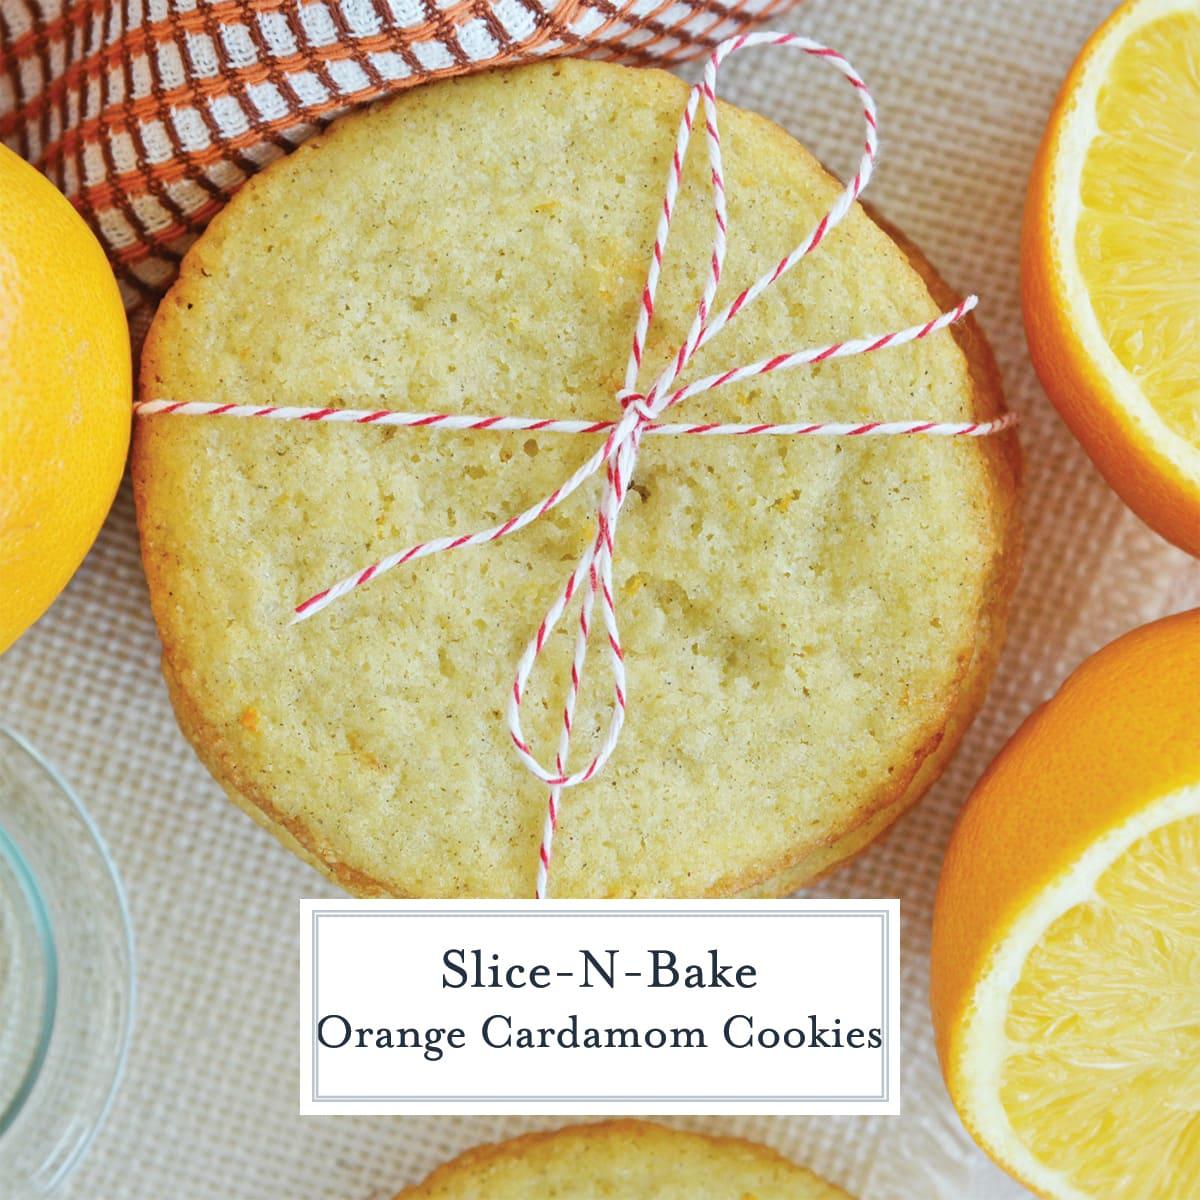 overhead of tied orange cardamom cookies with fresh oranges